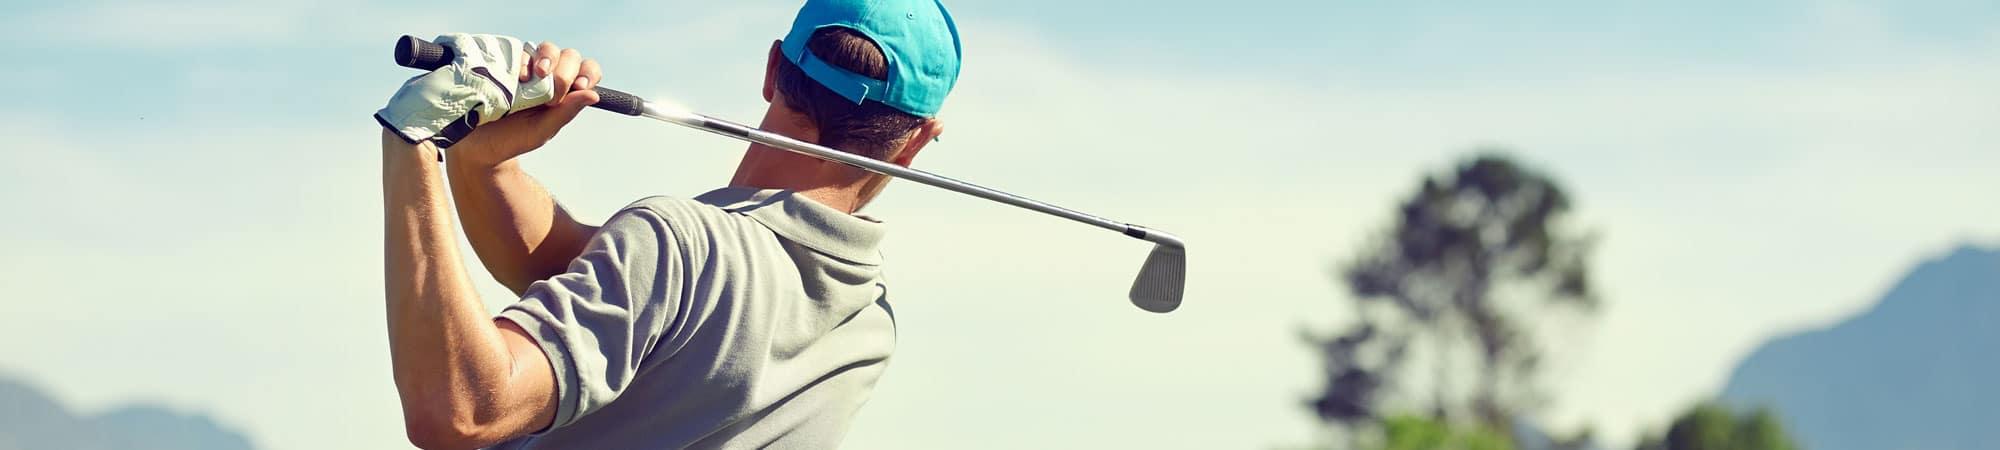 Specialist in de golfsport